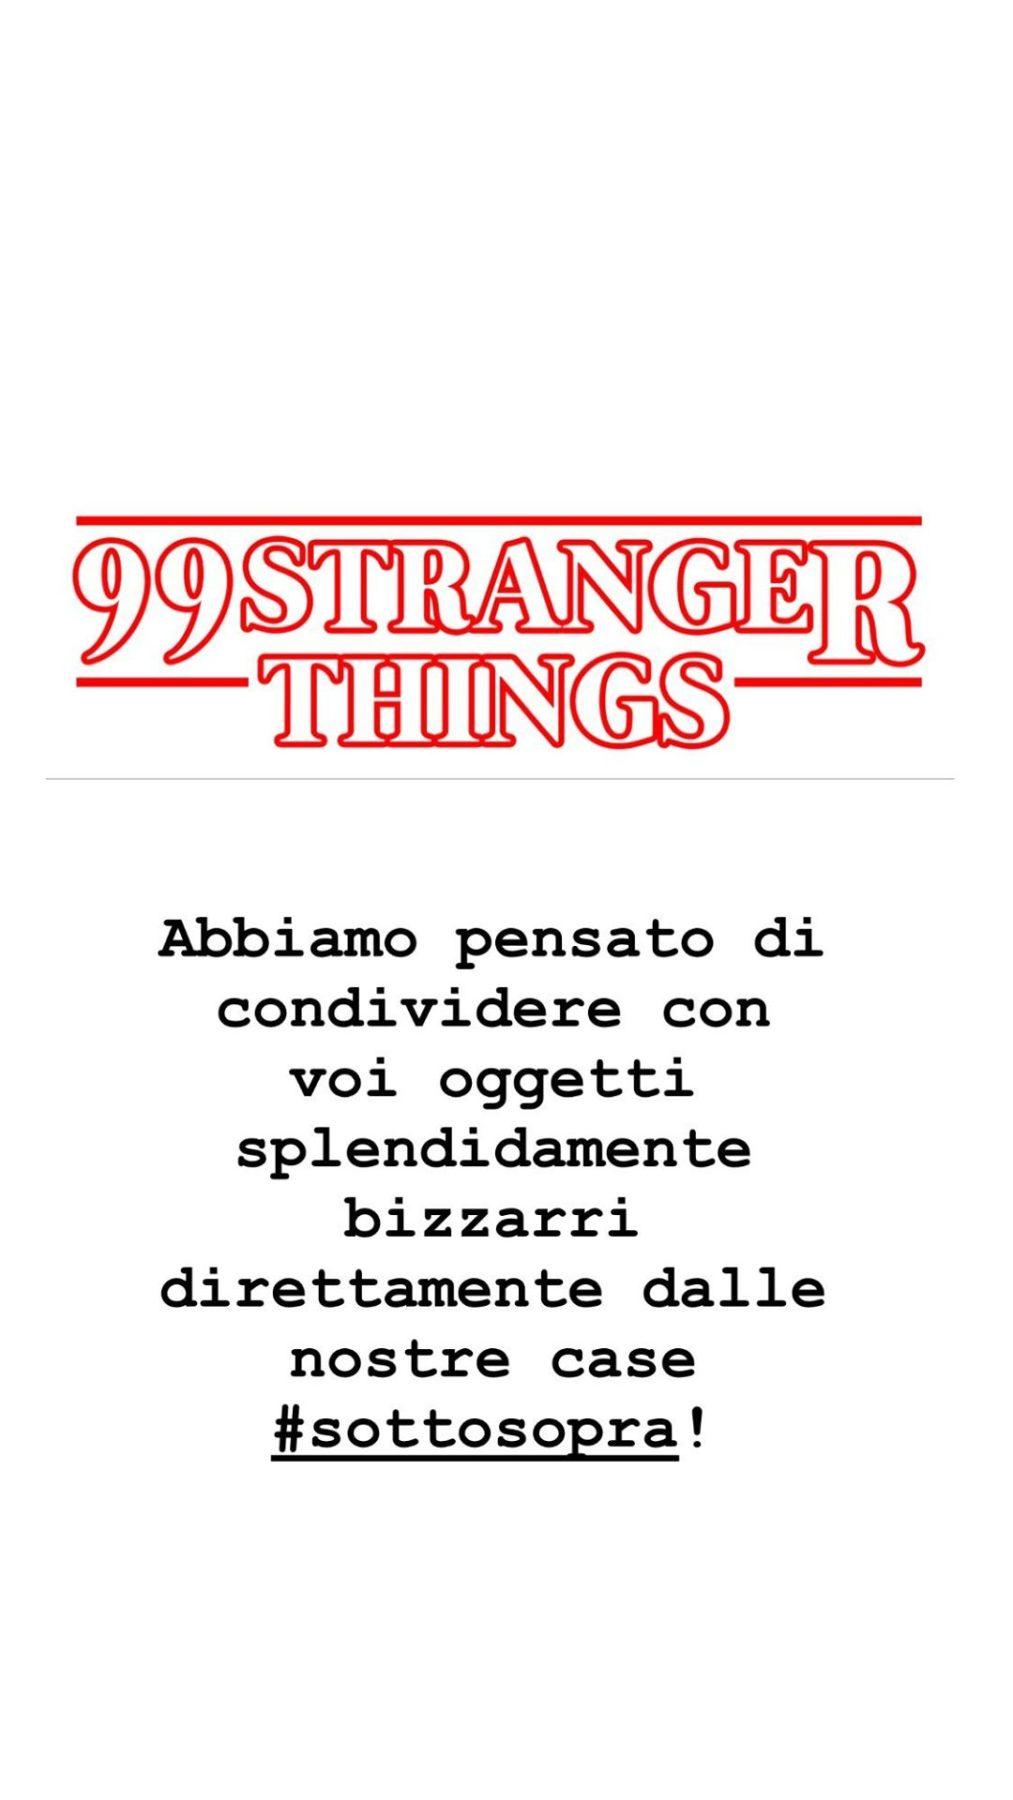 99objects 99strangerthings 1